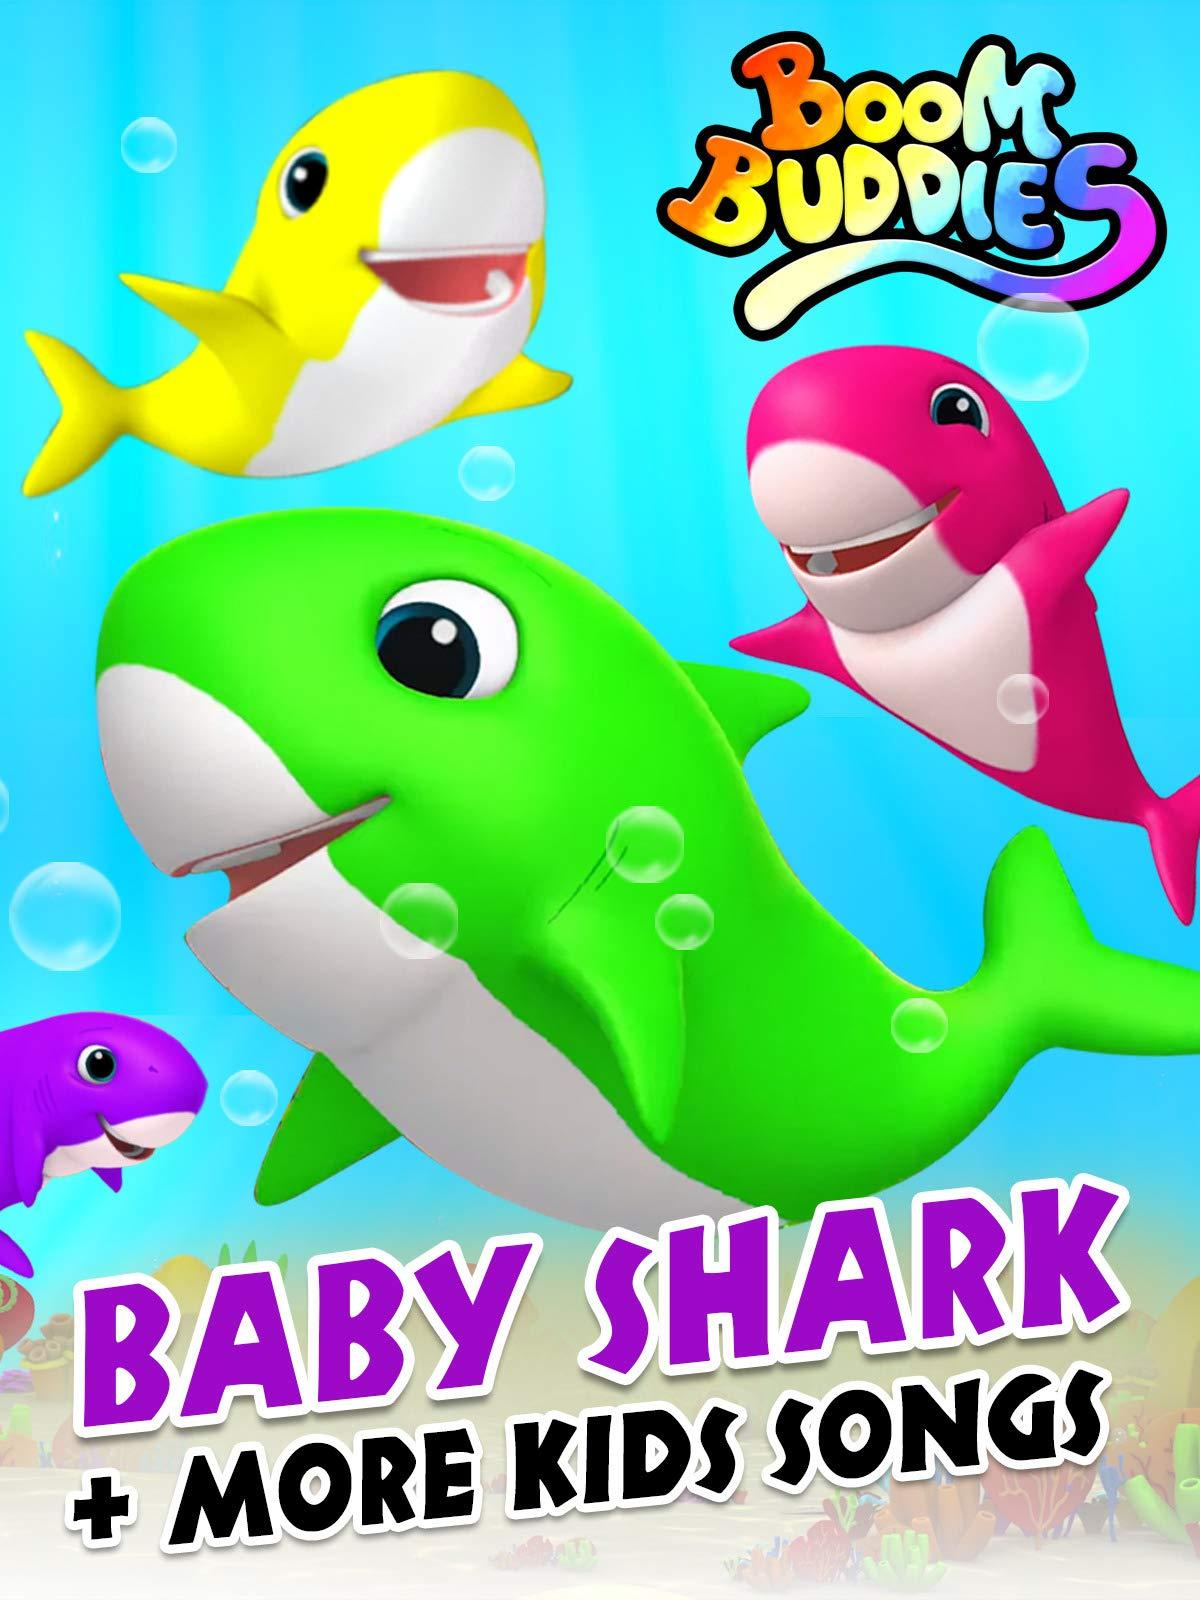 Baby Shark Plus More Kids Songs by Boom Buddies